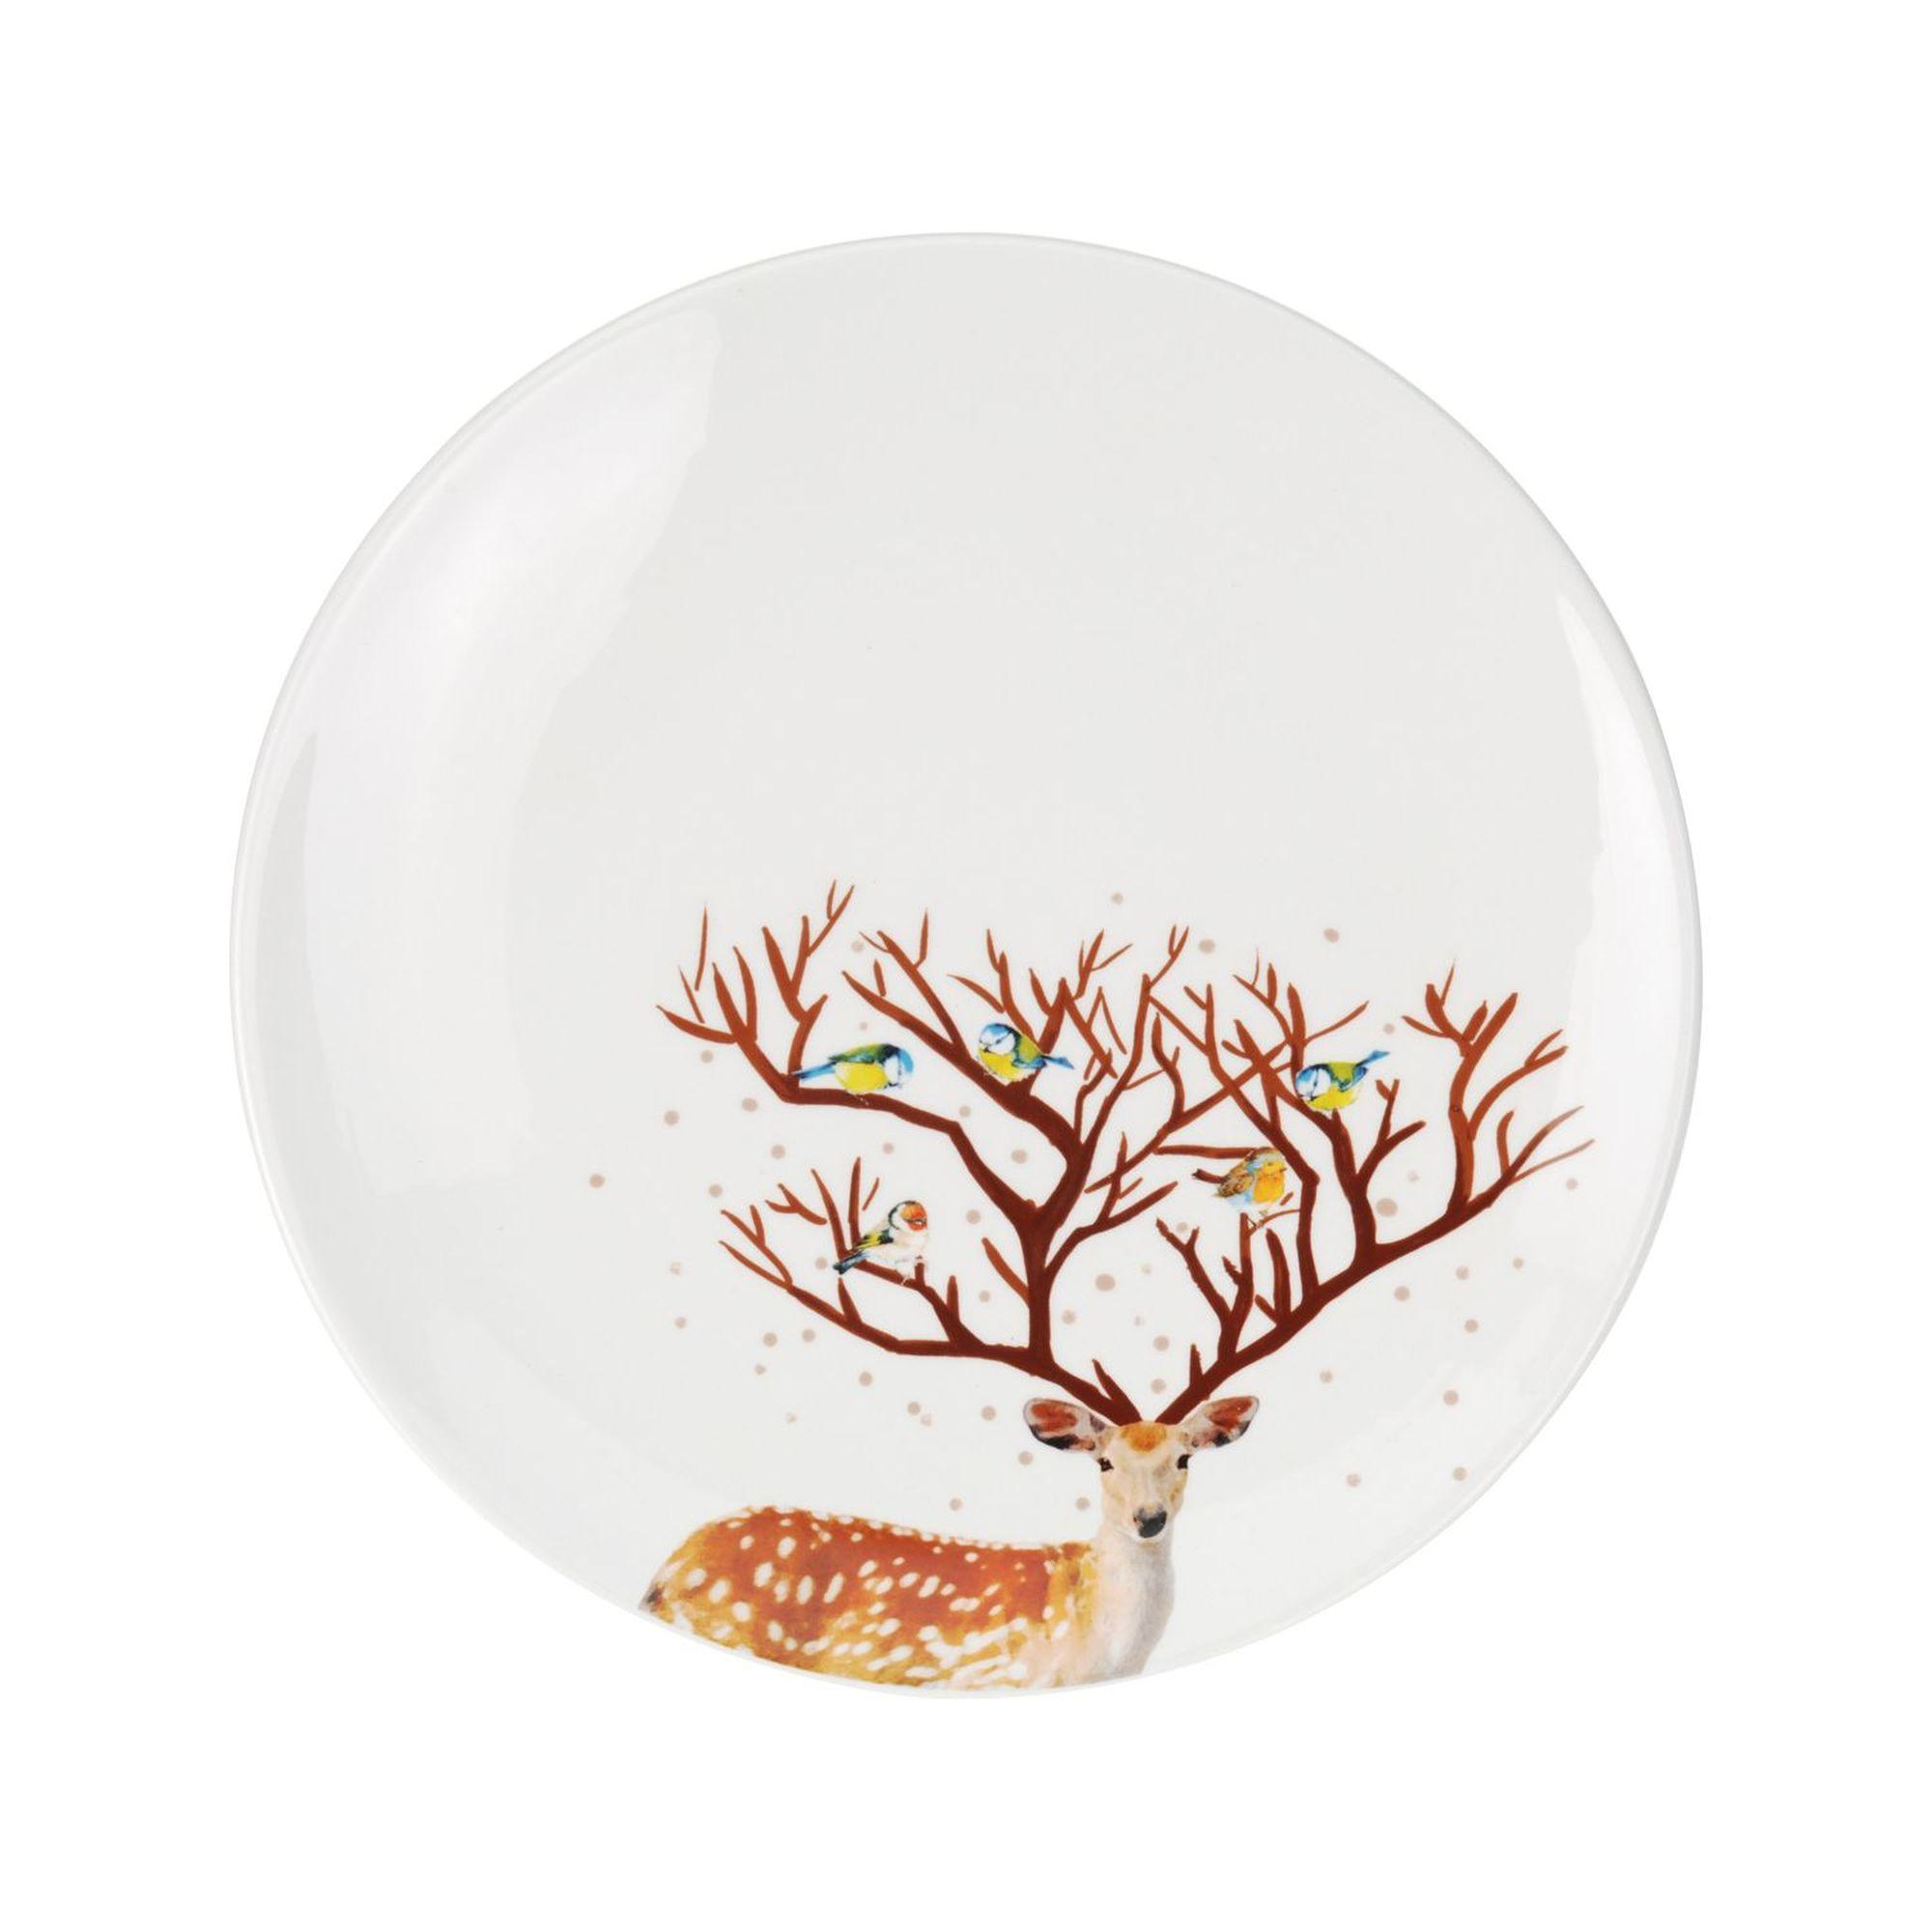 Тарелка Олень<br>